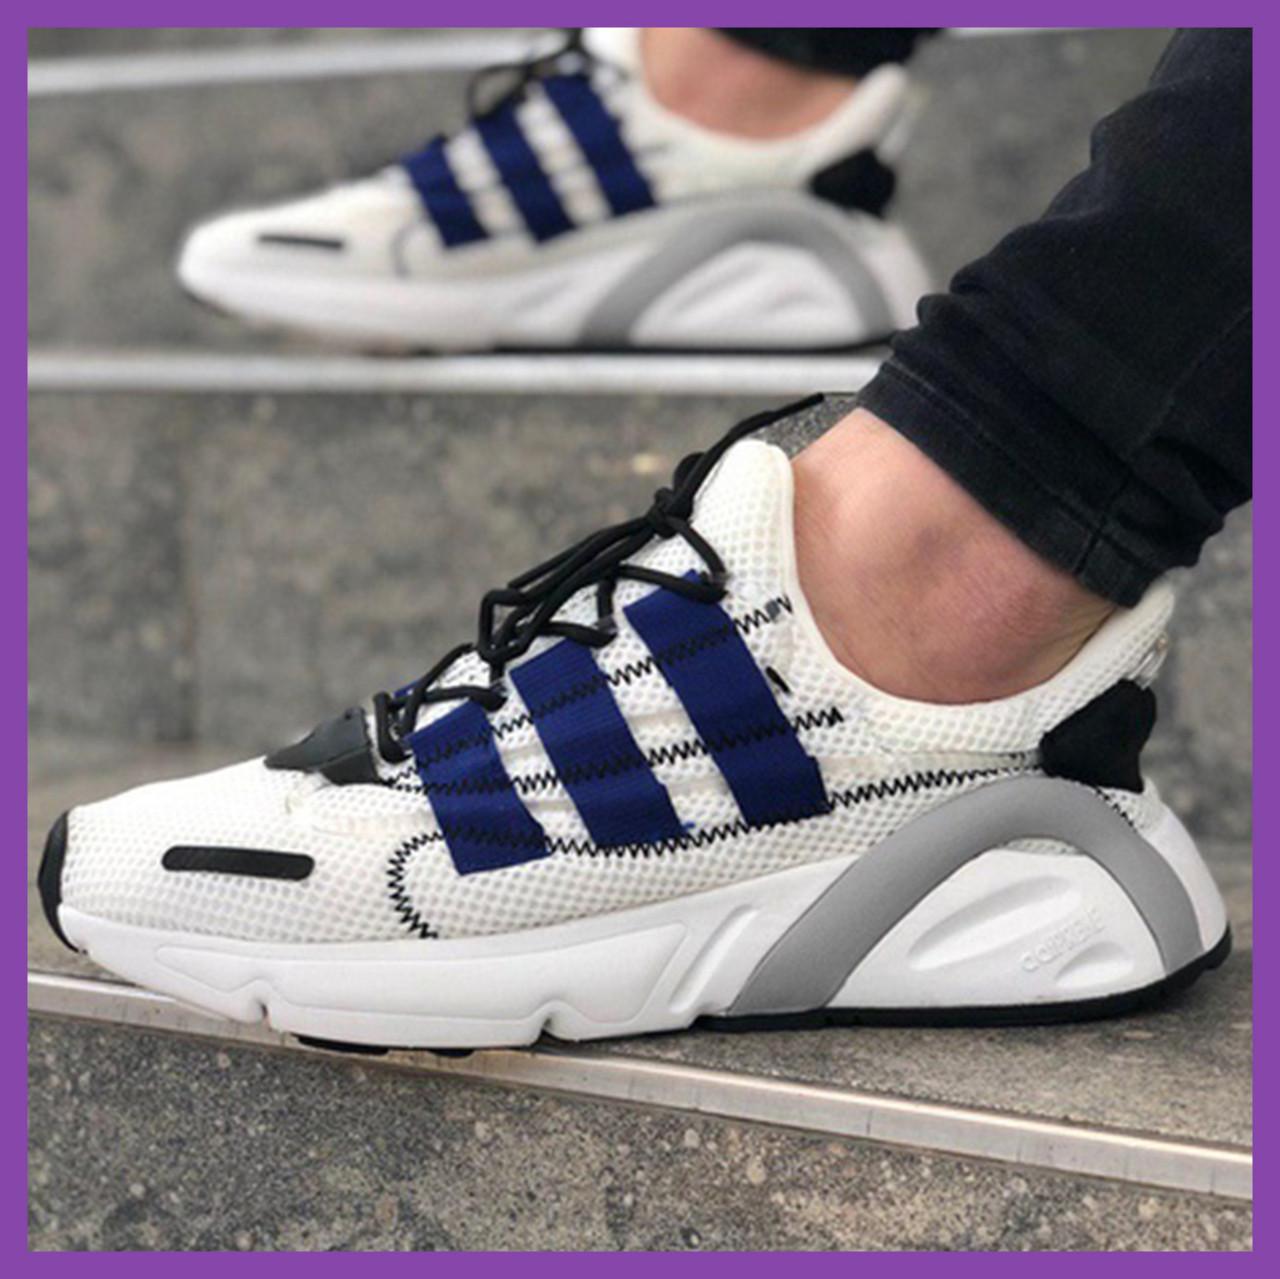 check out 16c43 9dd0c Мужские кроссовки Adidas Yeezy Boost 600